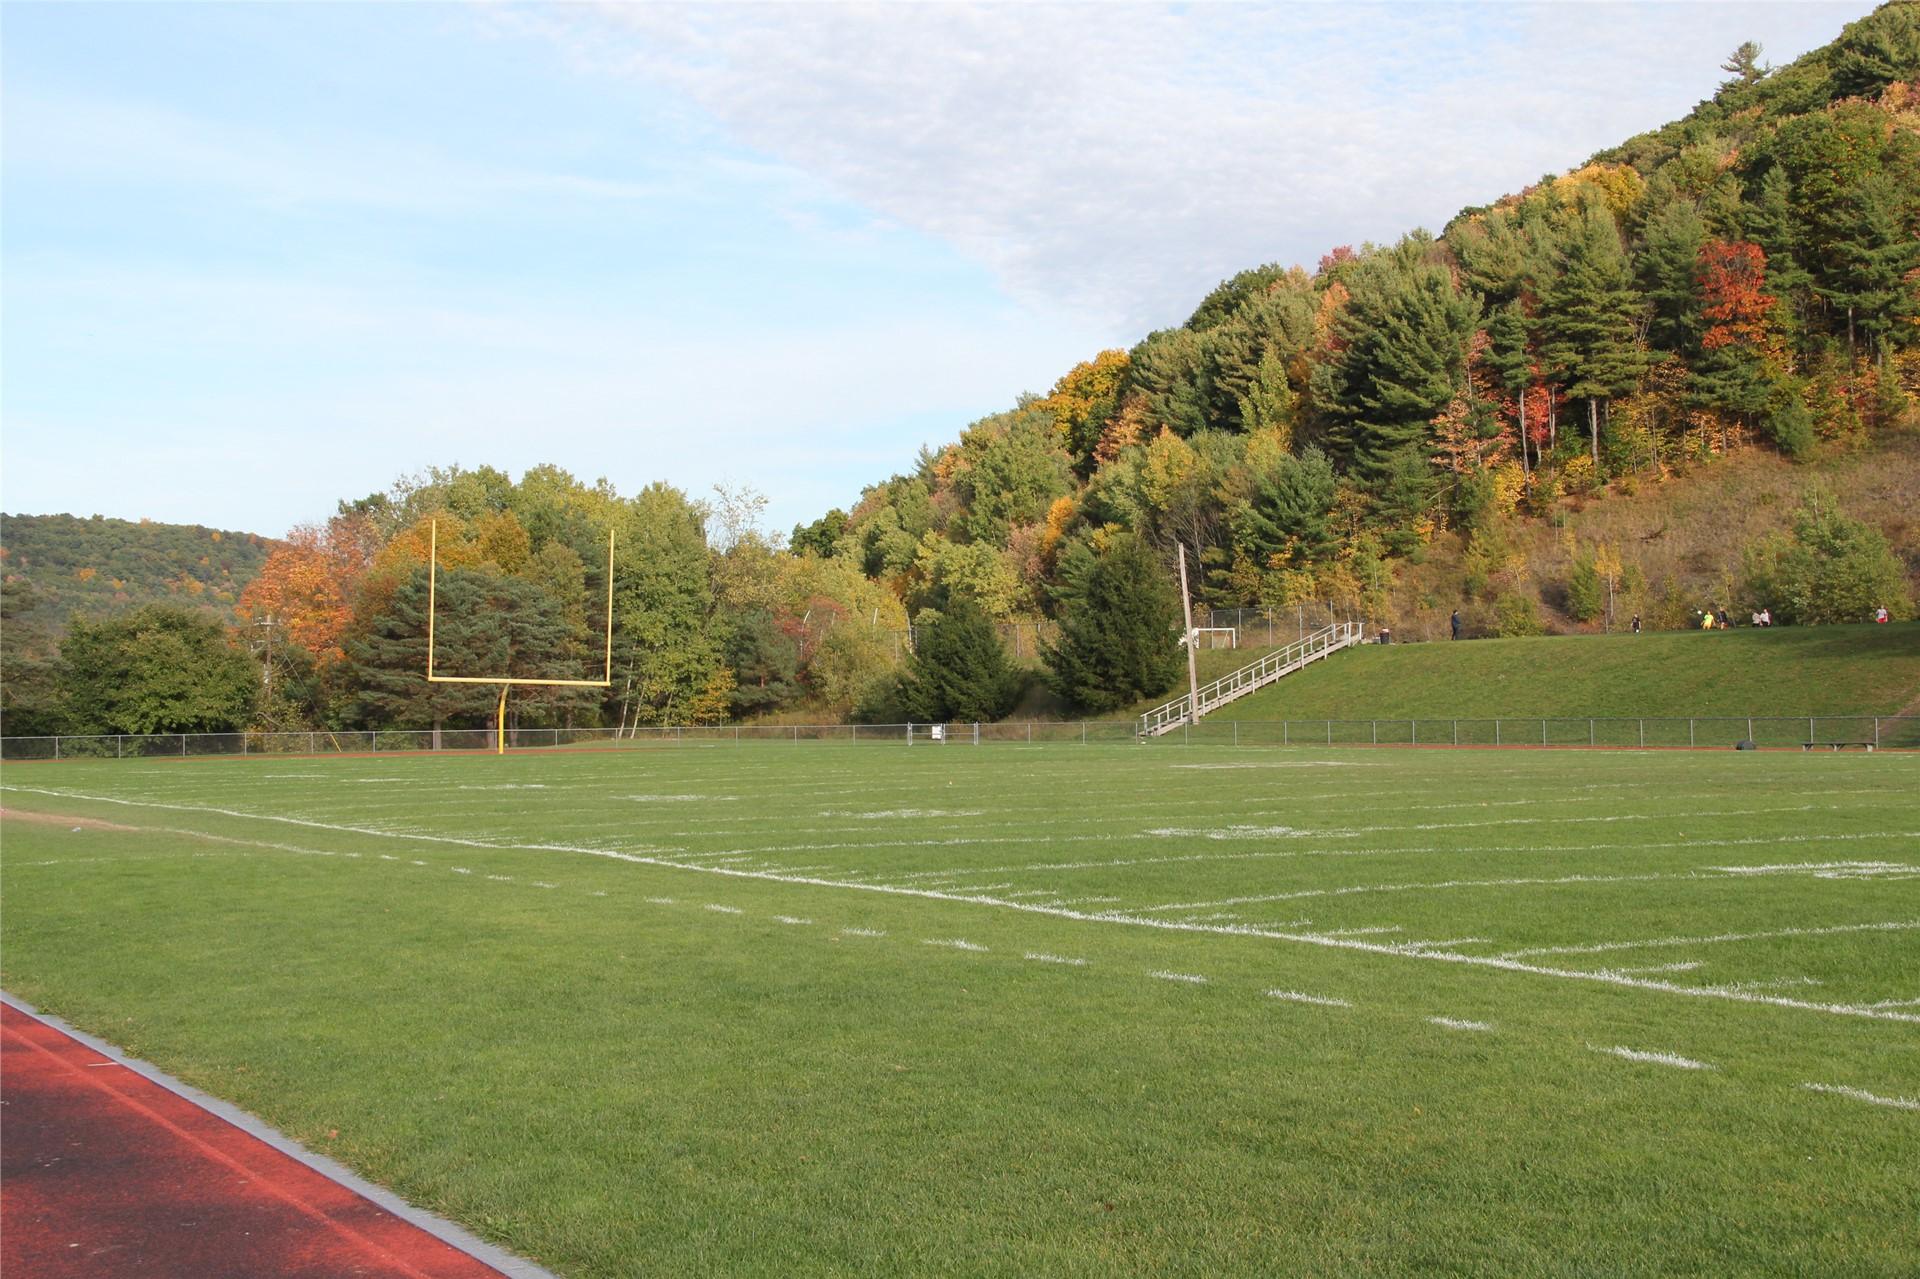 far shot of football field